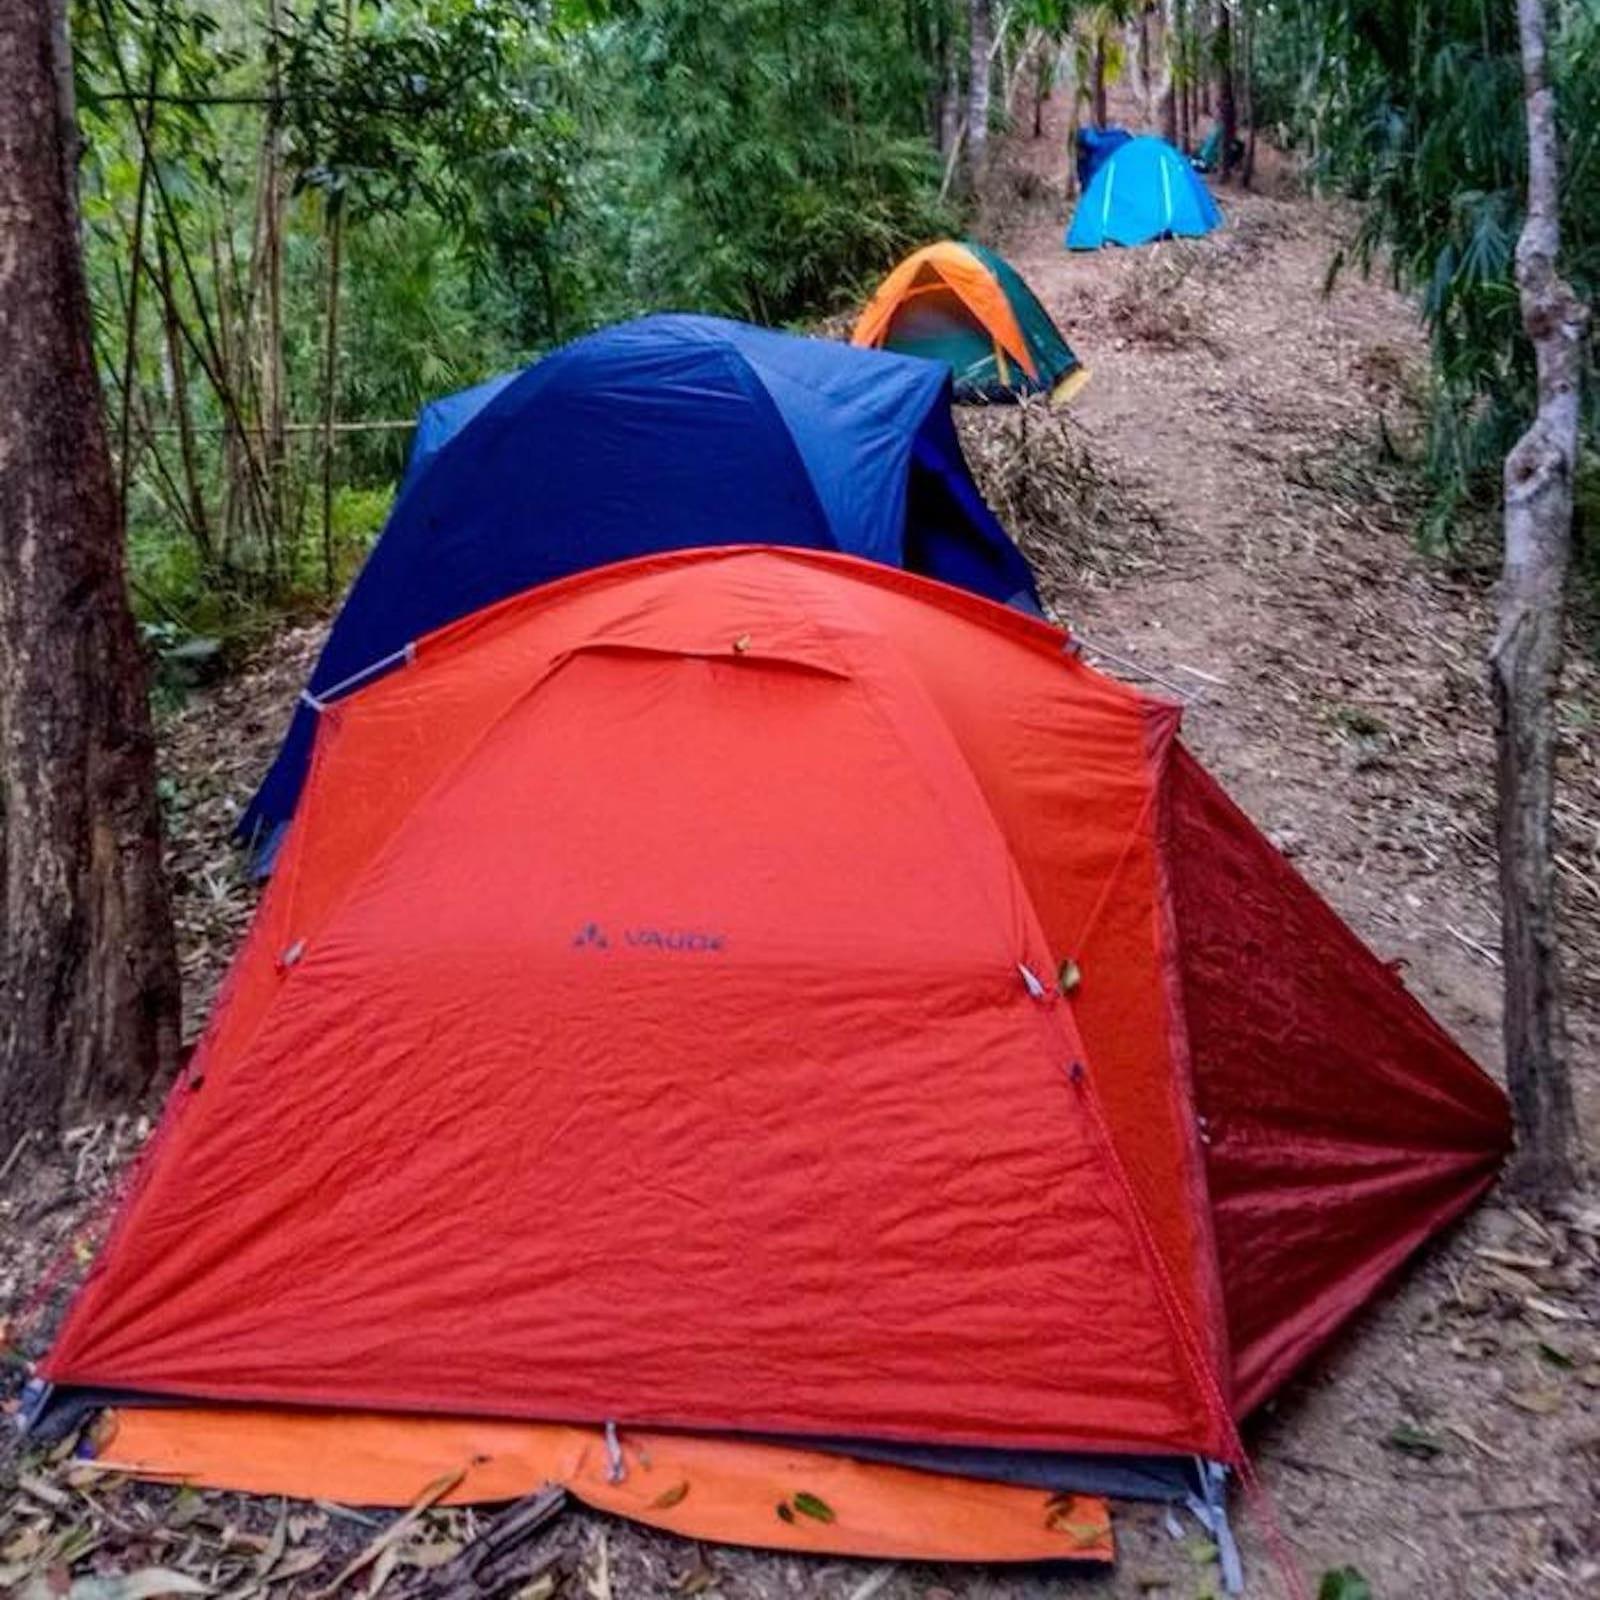 Camping in Ta Dung Lake, Dak Nong Province